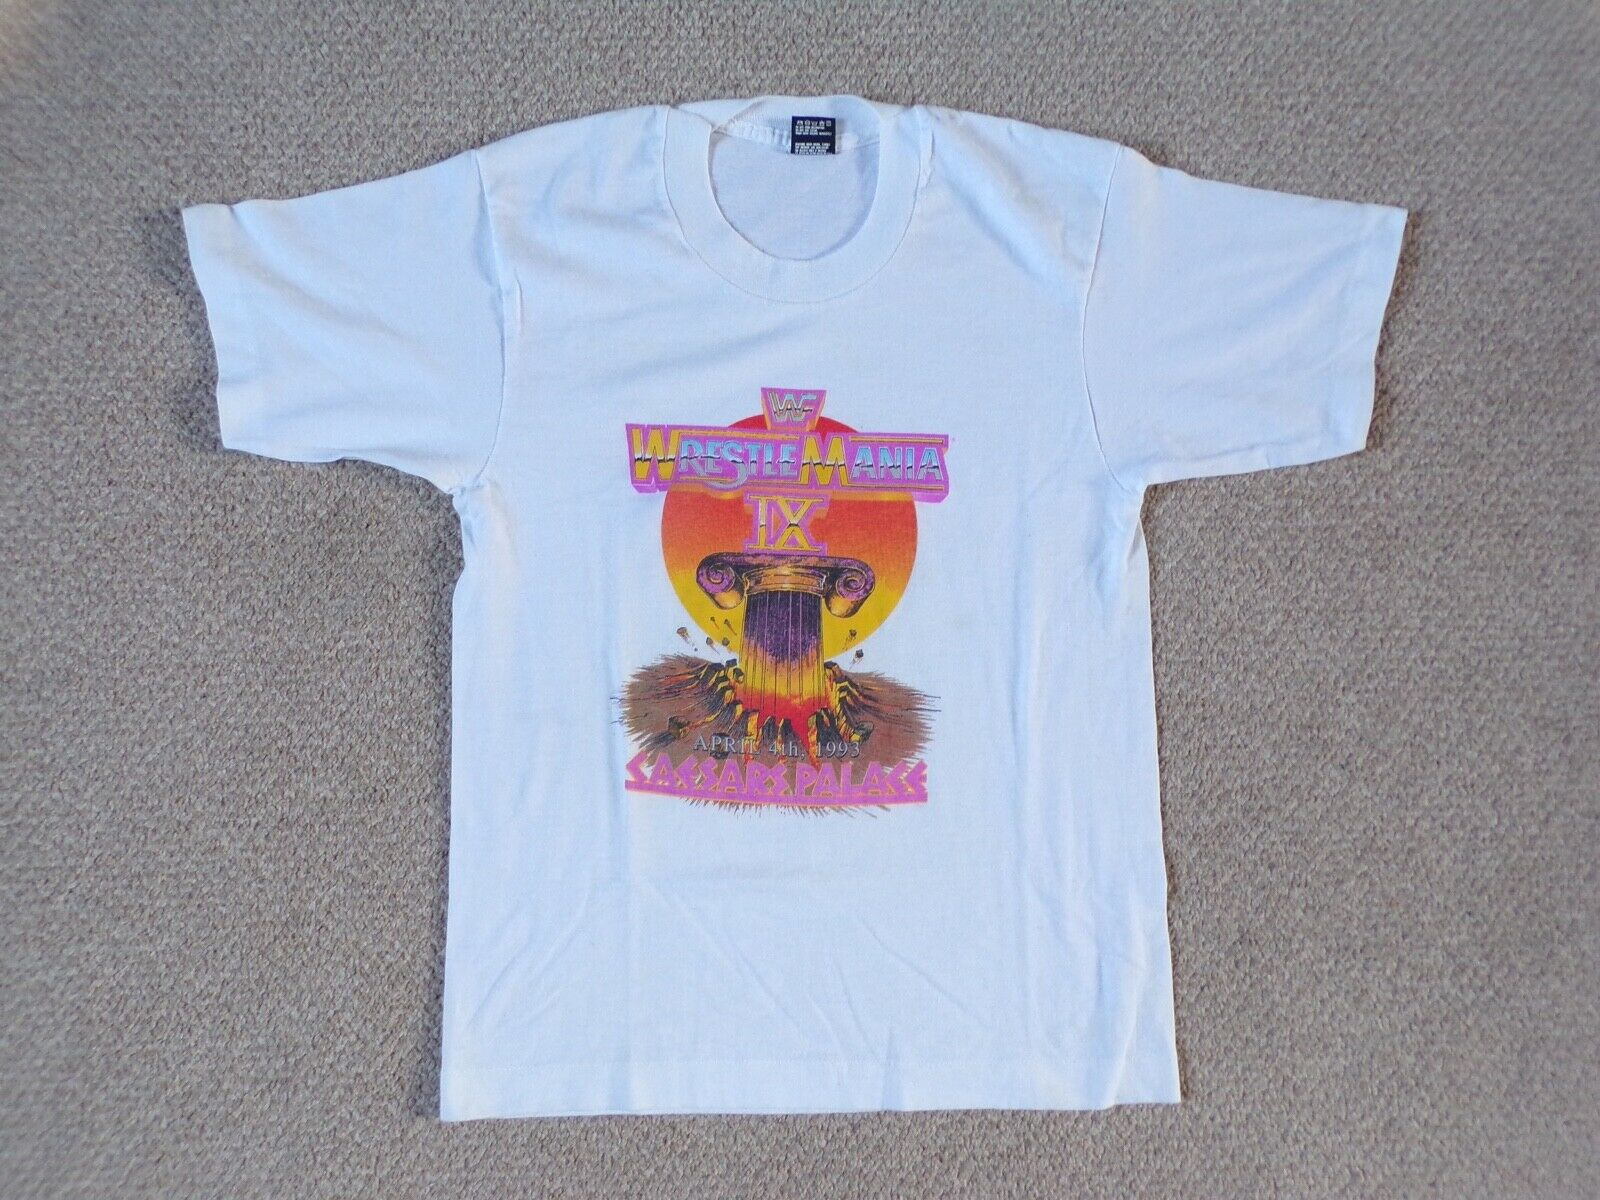 VINTAGE 1993 WWF WRESTLEuomoIA IX Bambino T-Shirt Retrò WRESTLING cimeli WWE